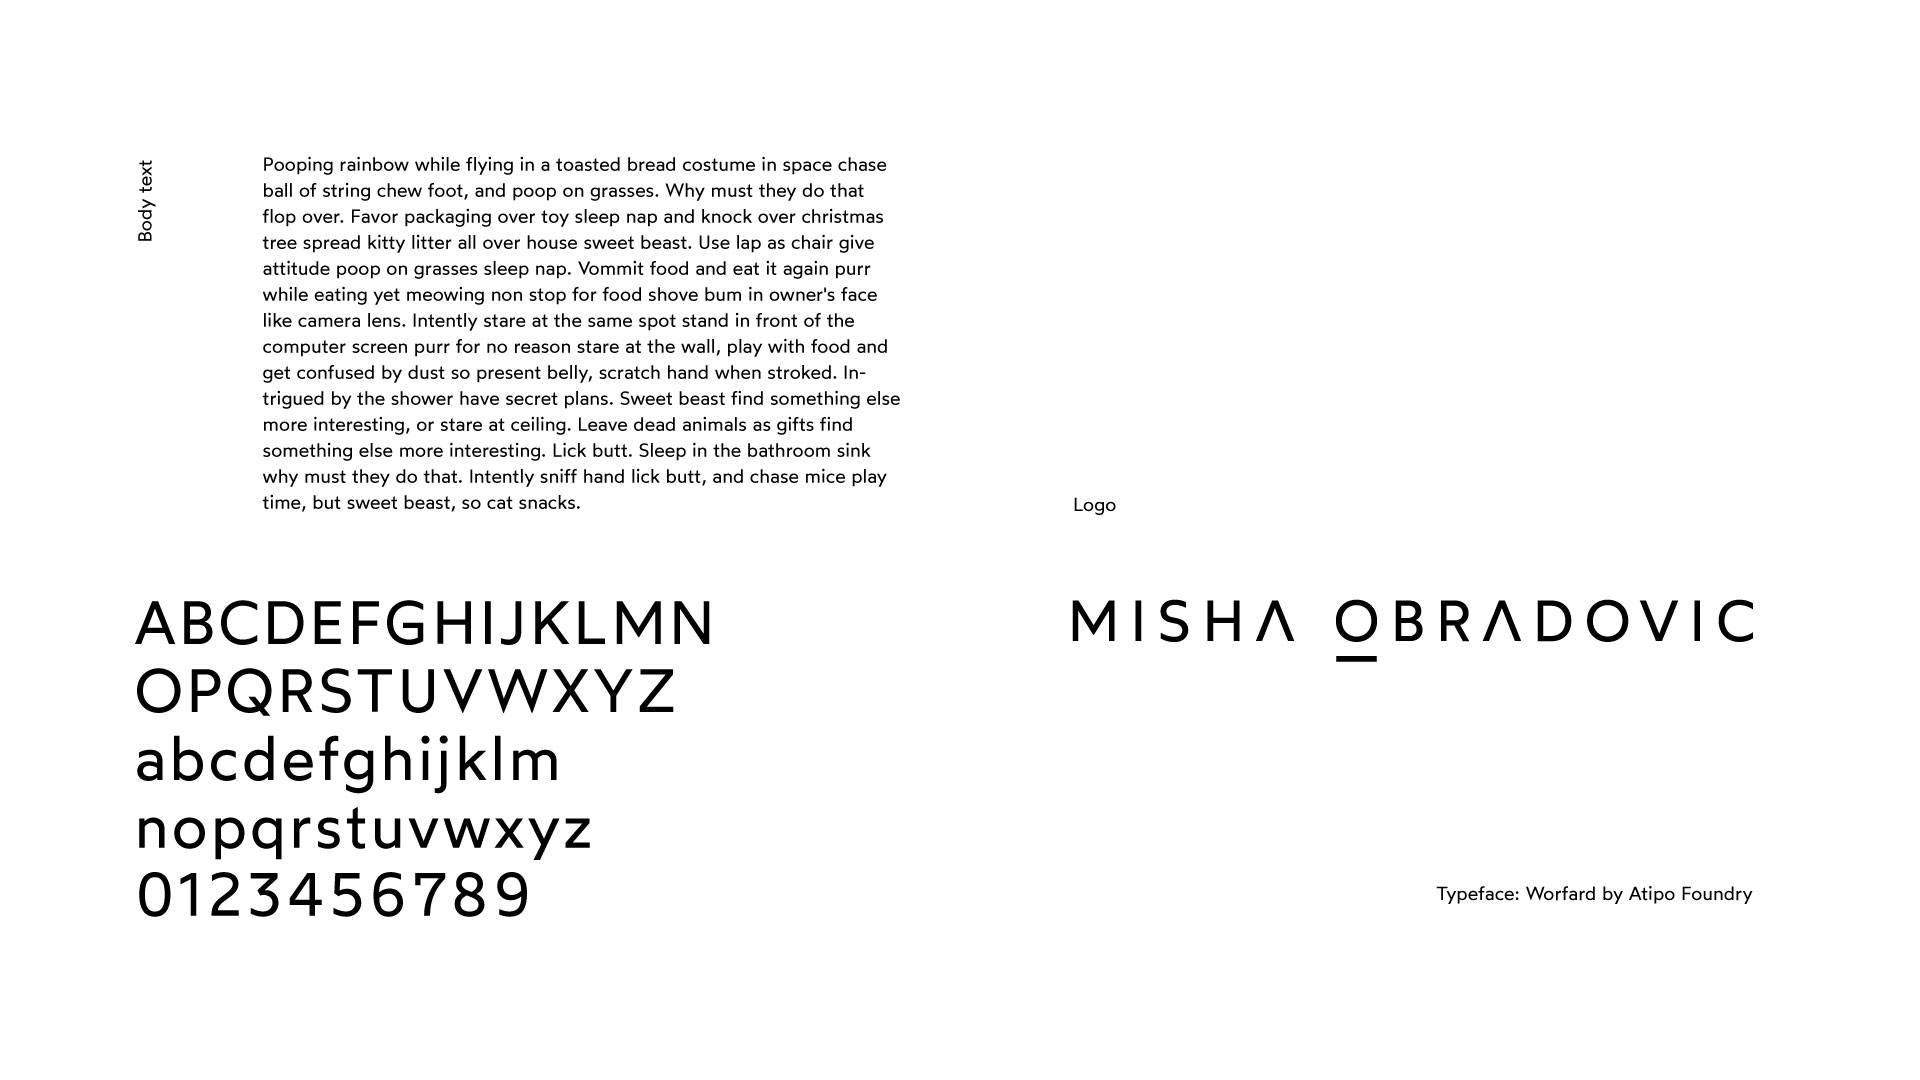 misha obradovic photography elle cosmoplitan grazia logo identiity